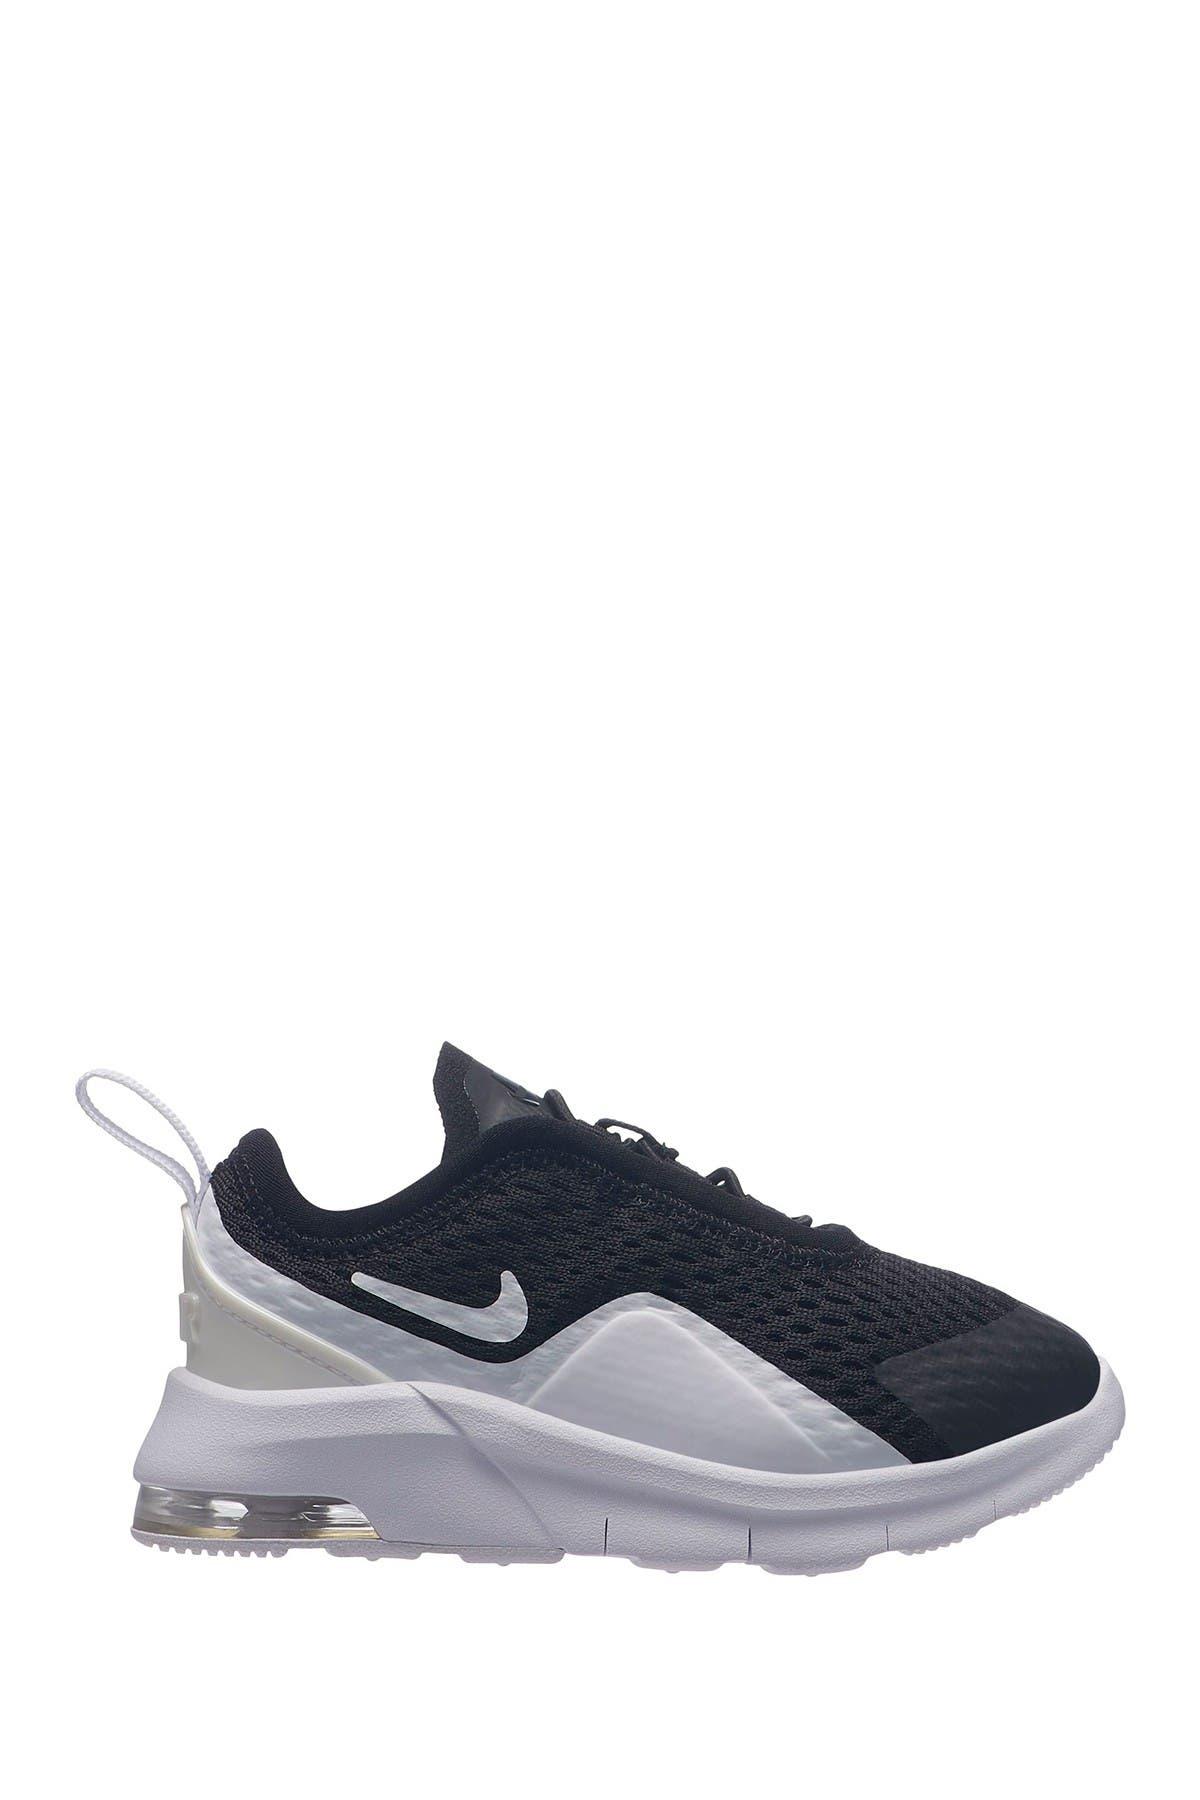 Image of Nike Air Max Motion 2 Sneaker